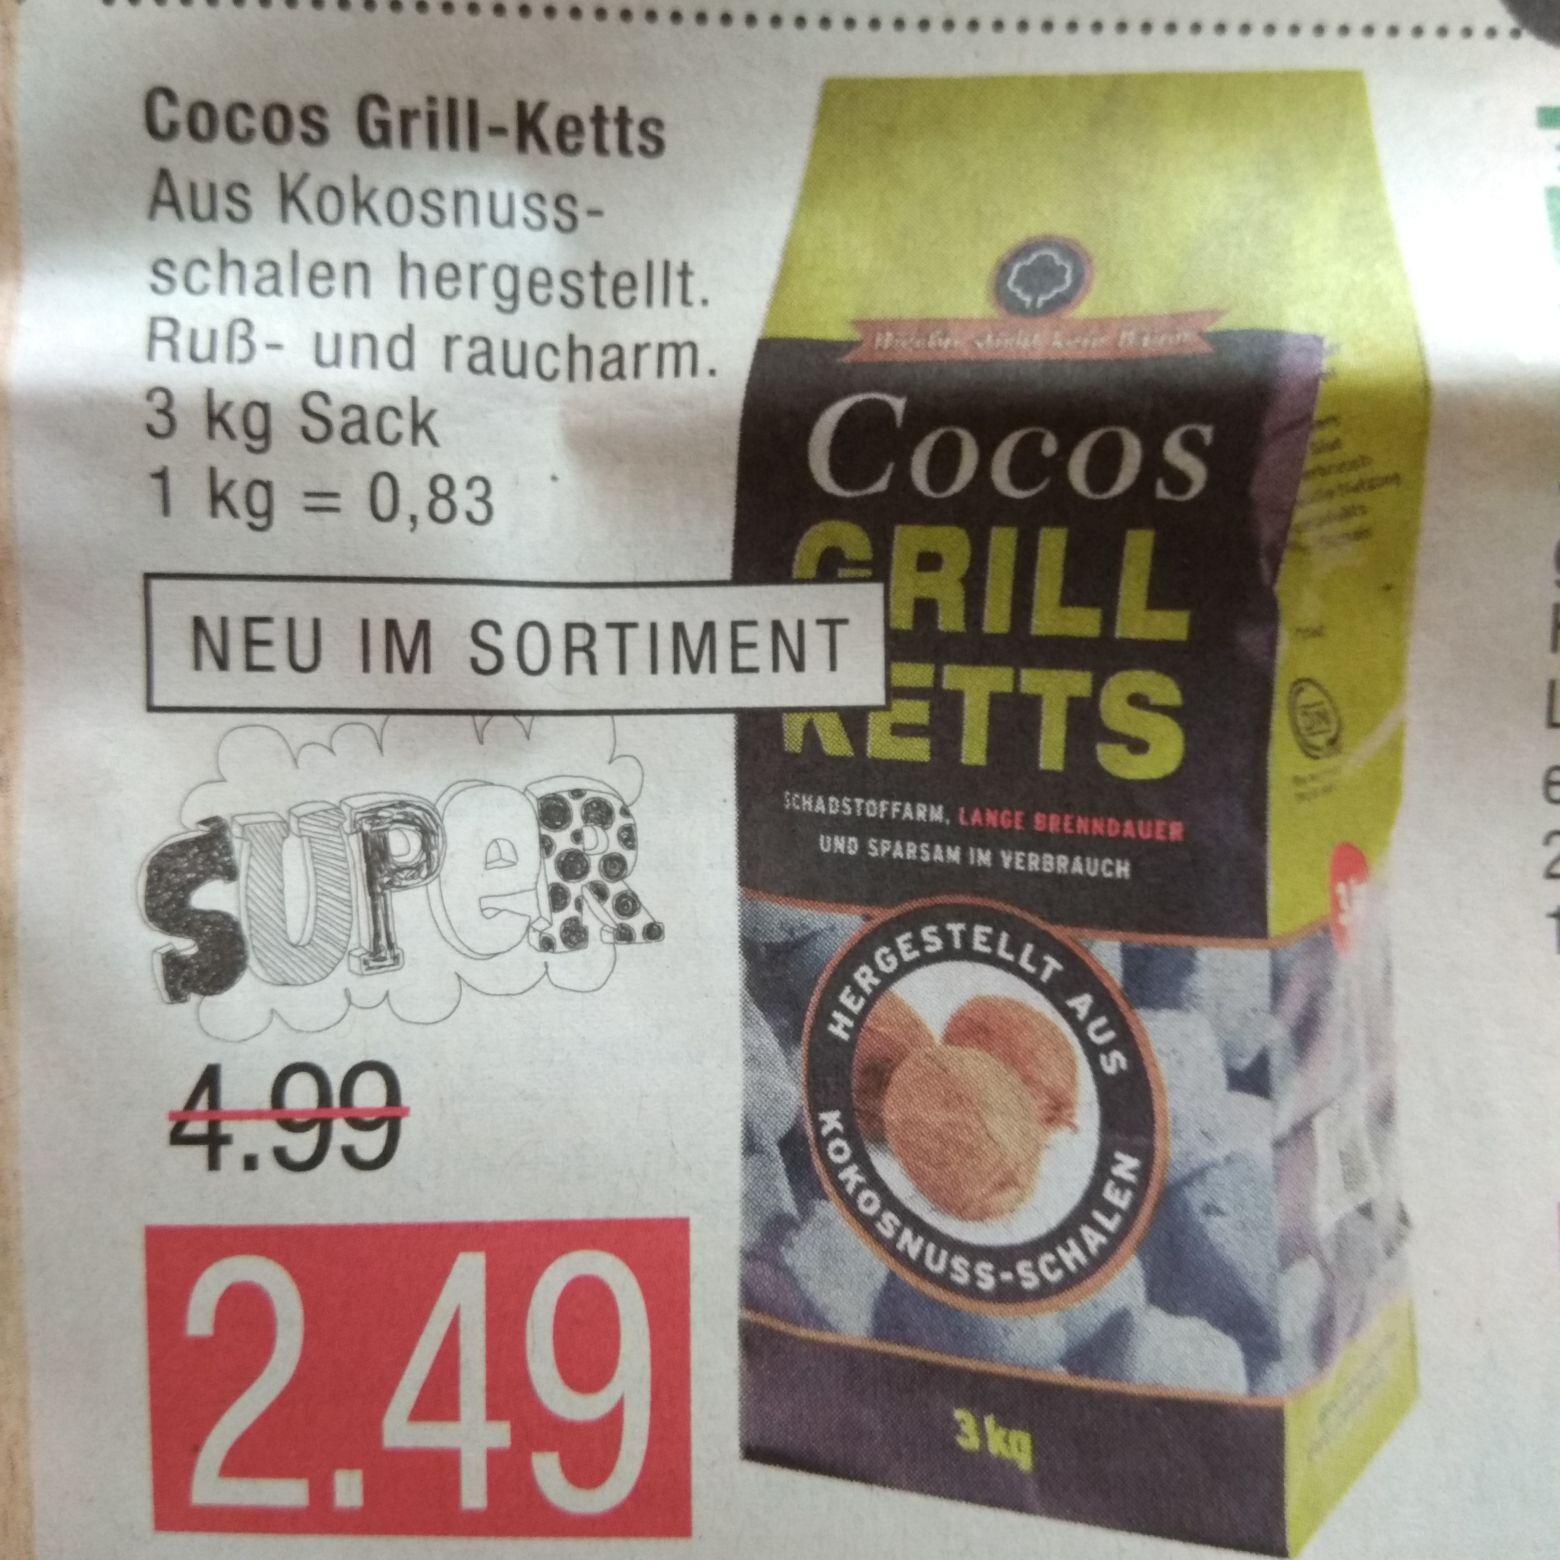 [lokal - alle Marktkauf-Center] Cocos Grillketts / Grill Ketts 3 kg Sack